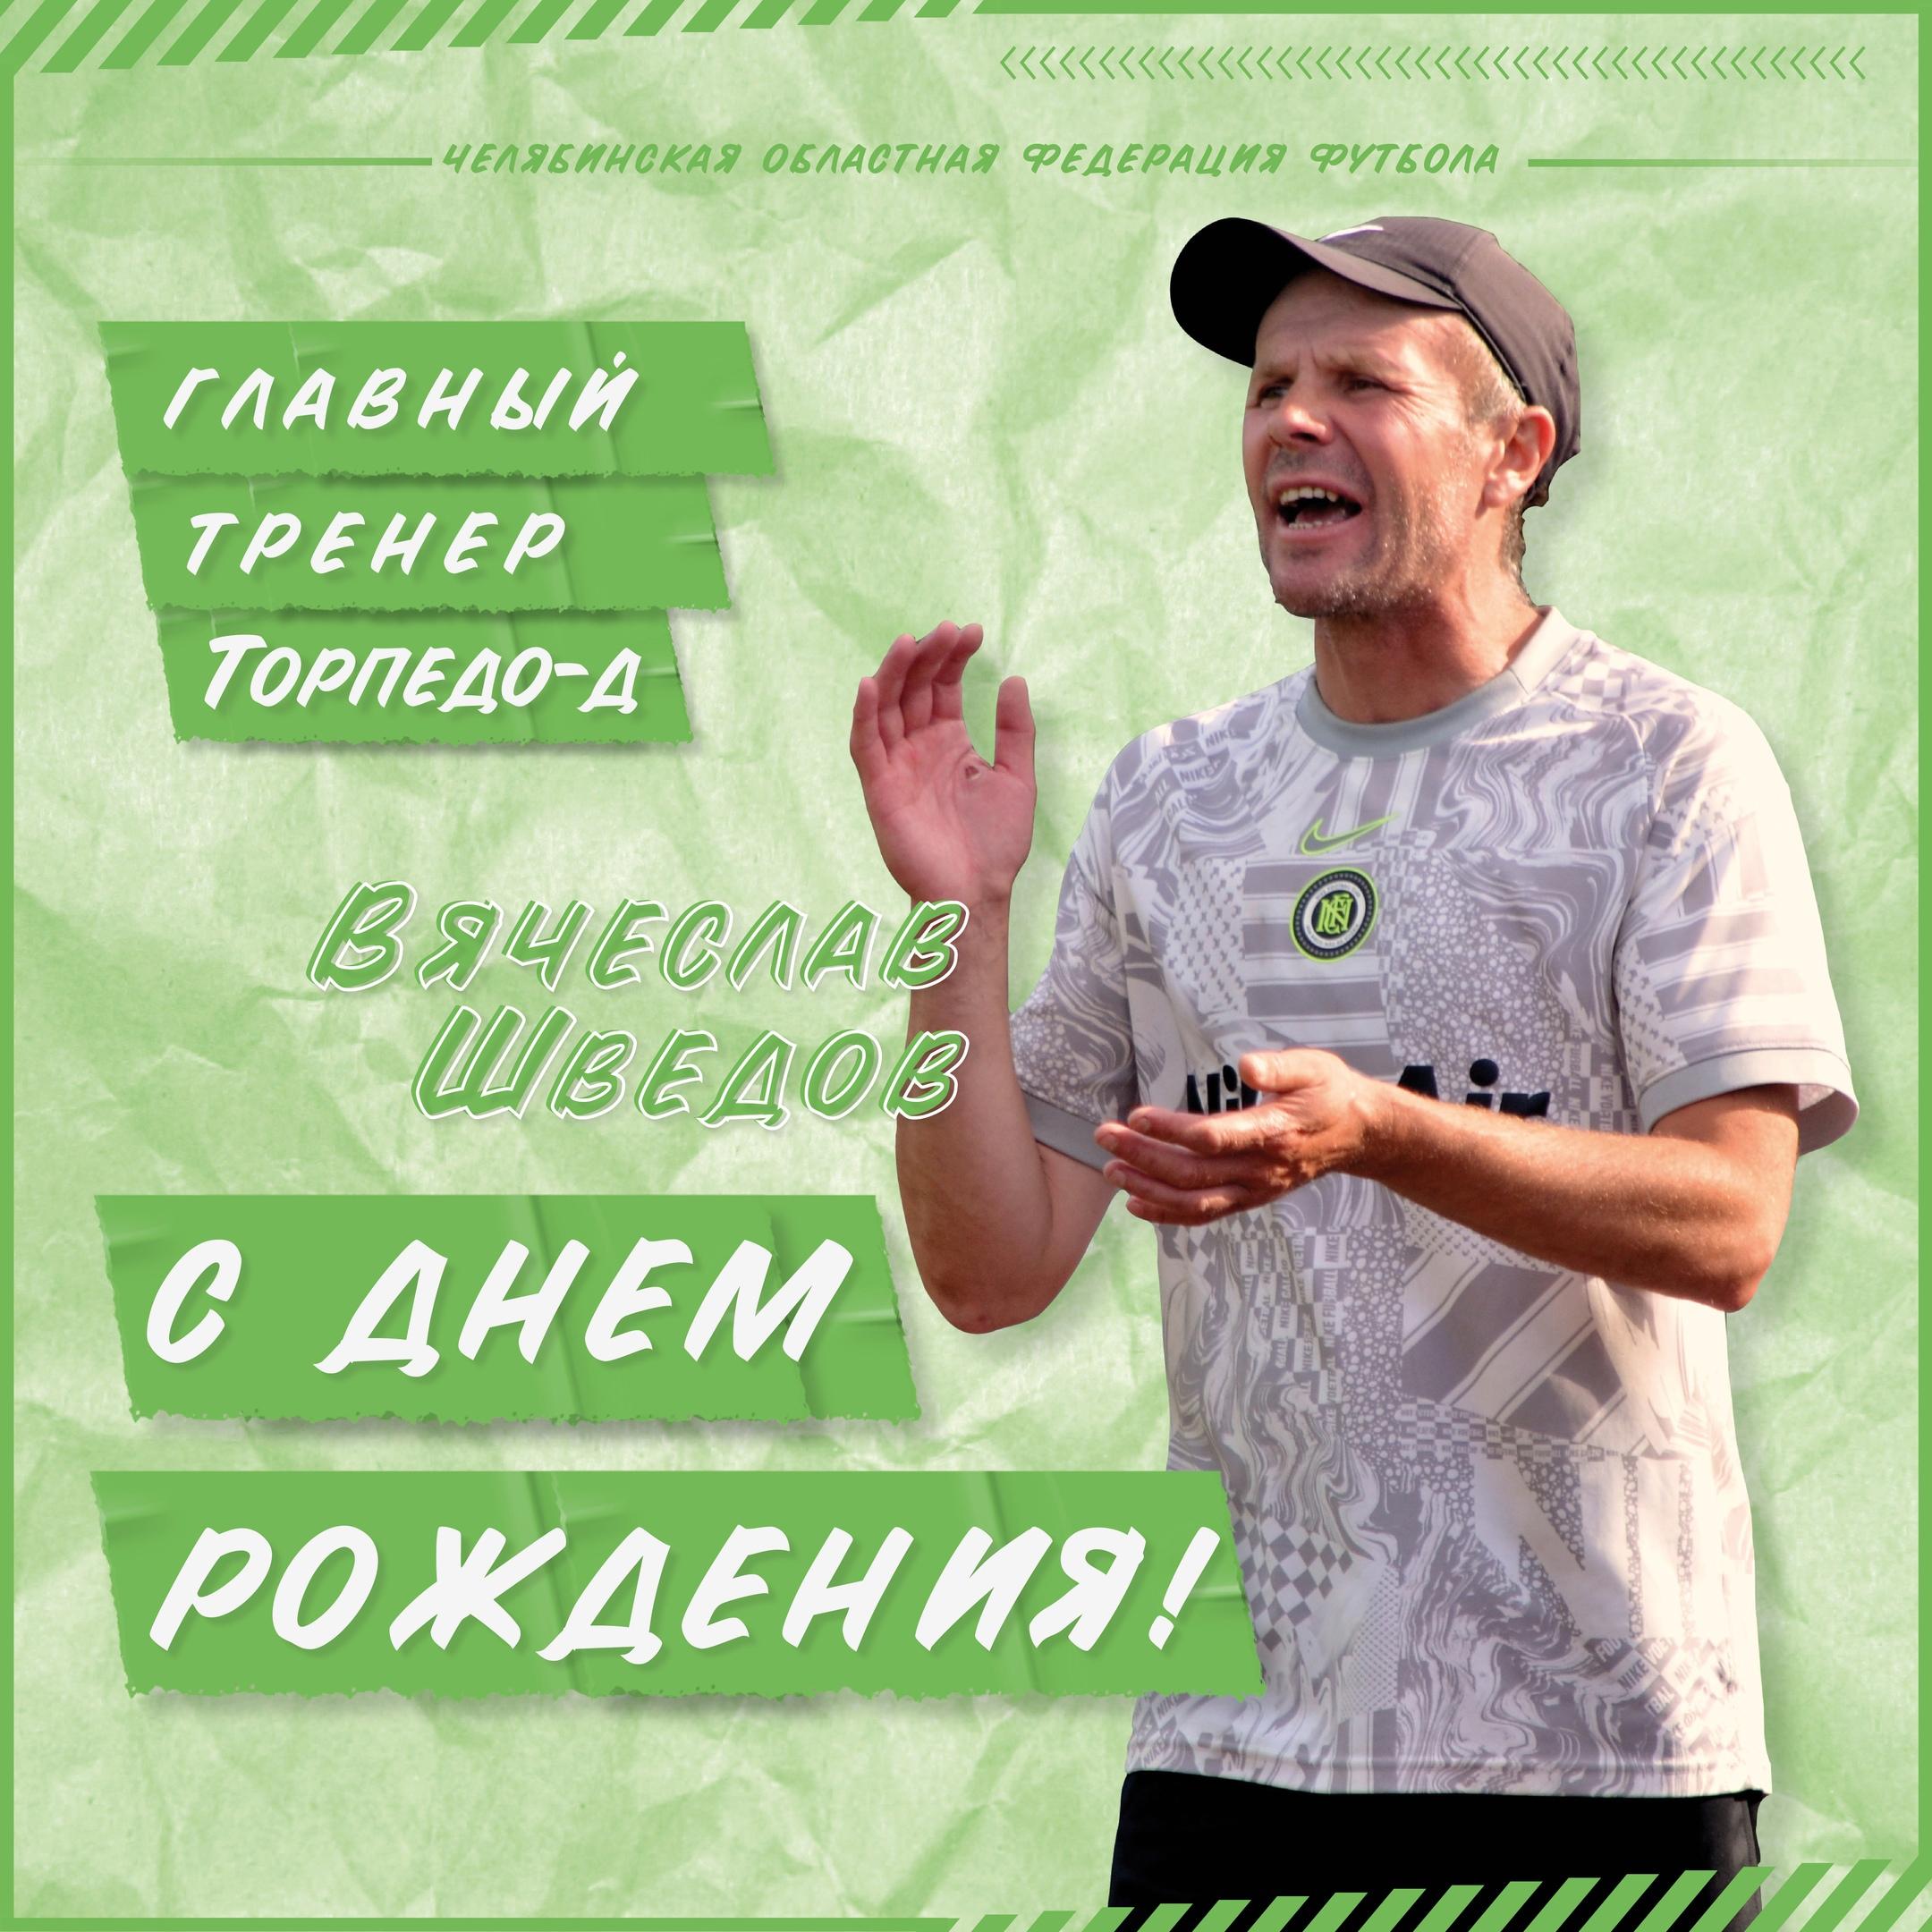 Вячеслав Шведов